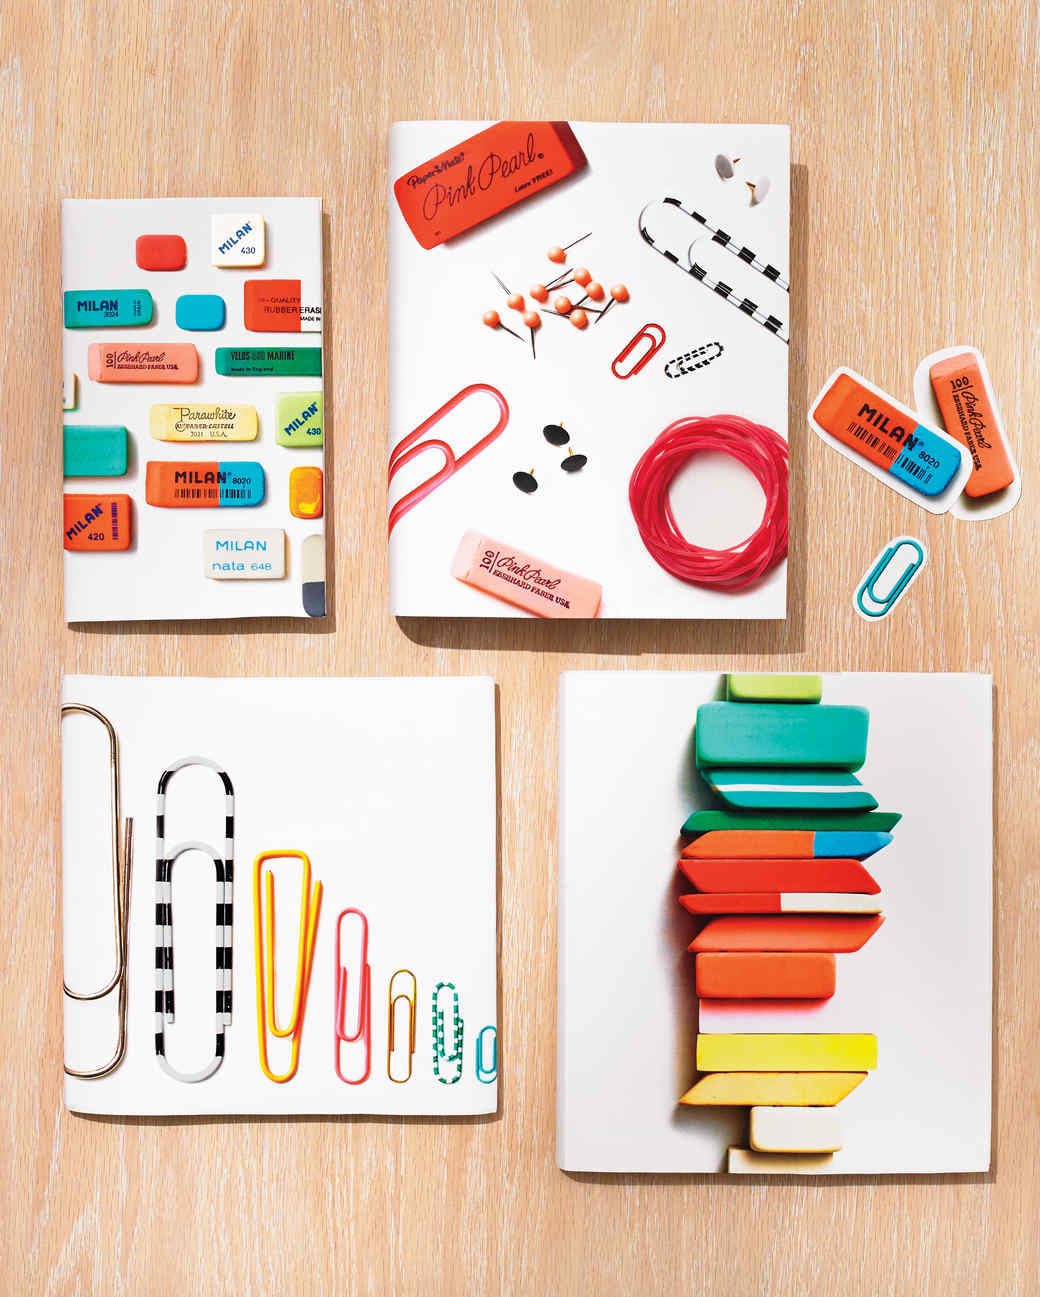 textbook-covers-211-d112159-r.jpg